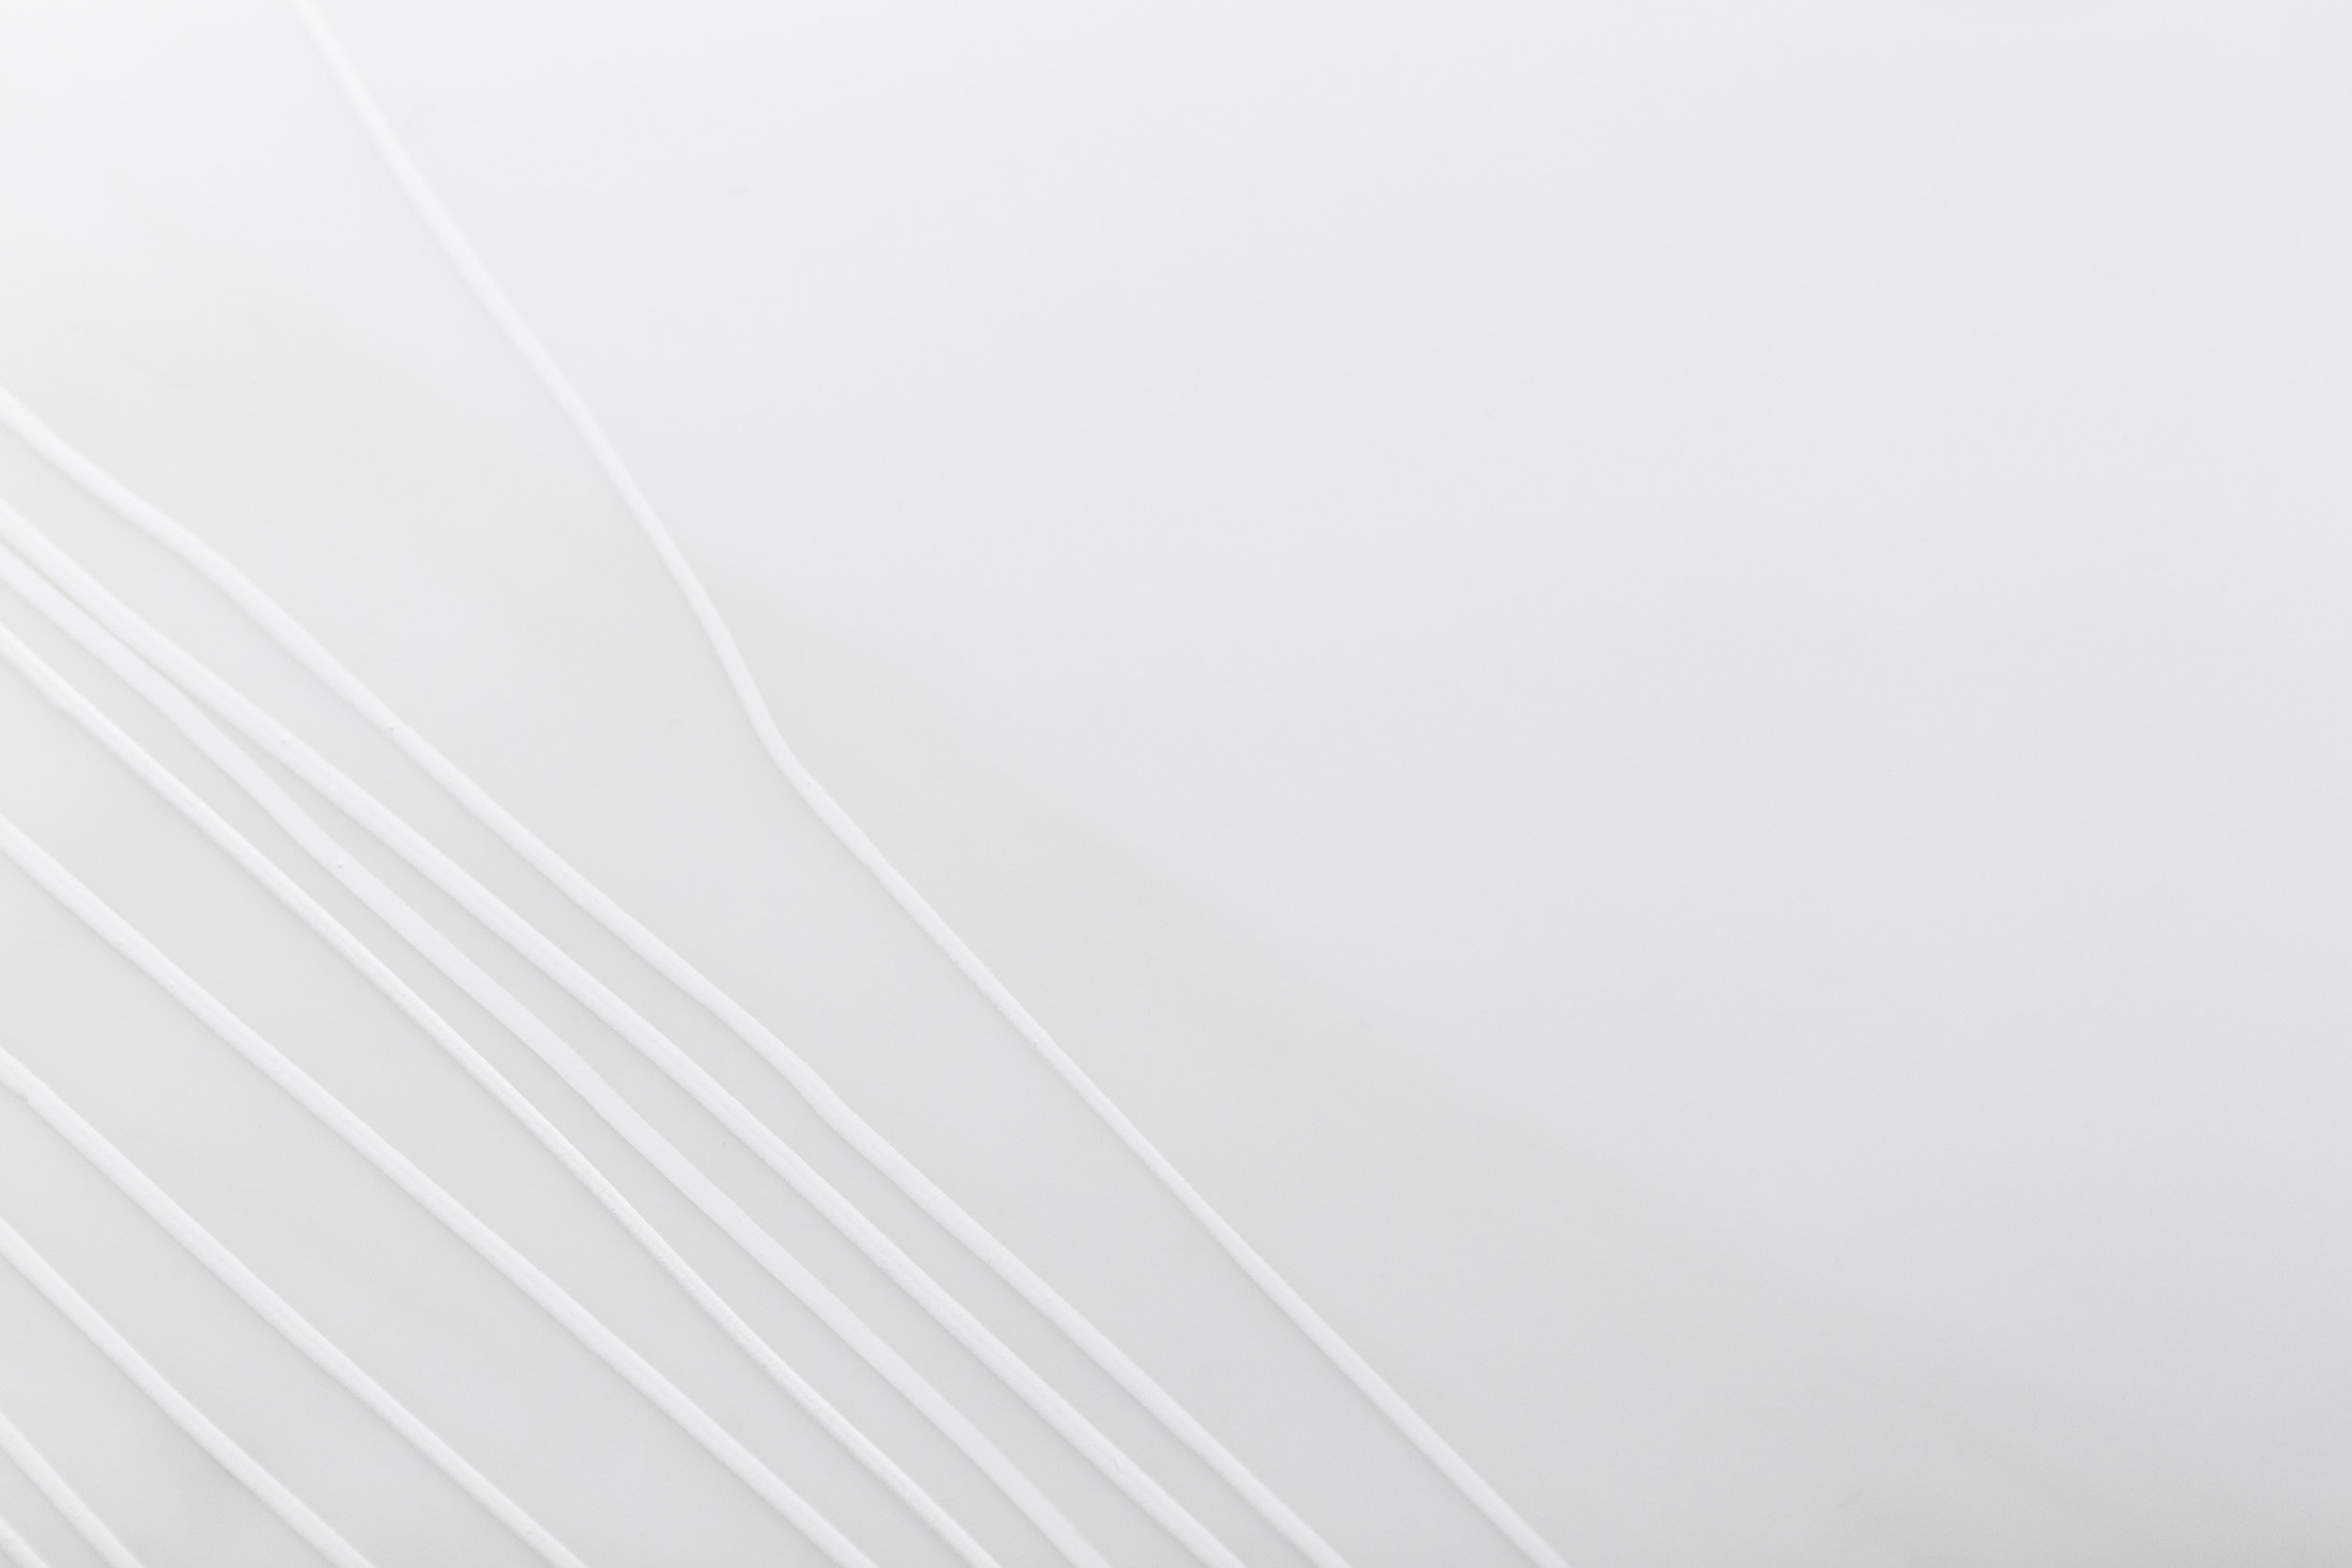 LulaJapan-7.jpg